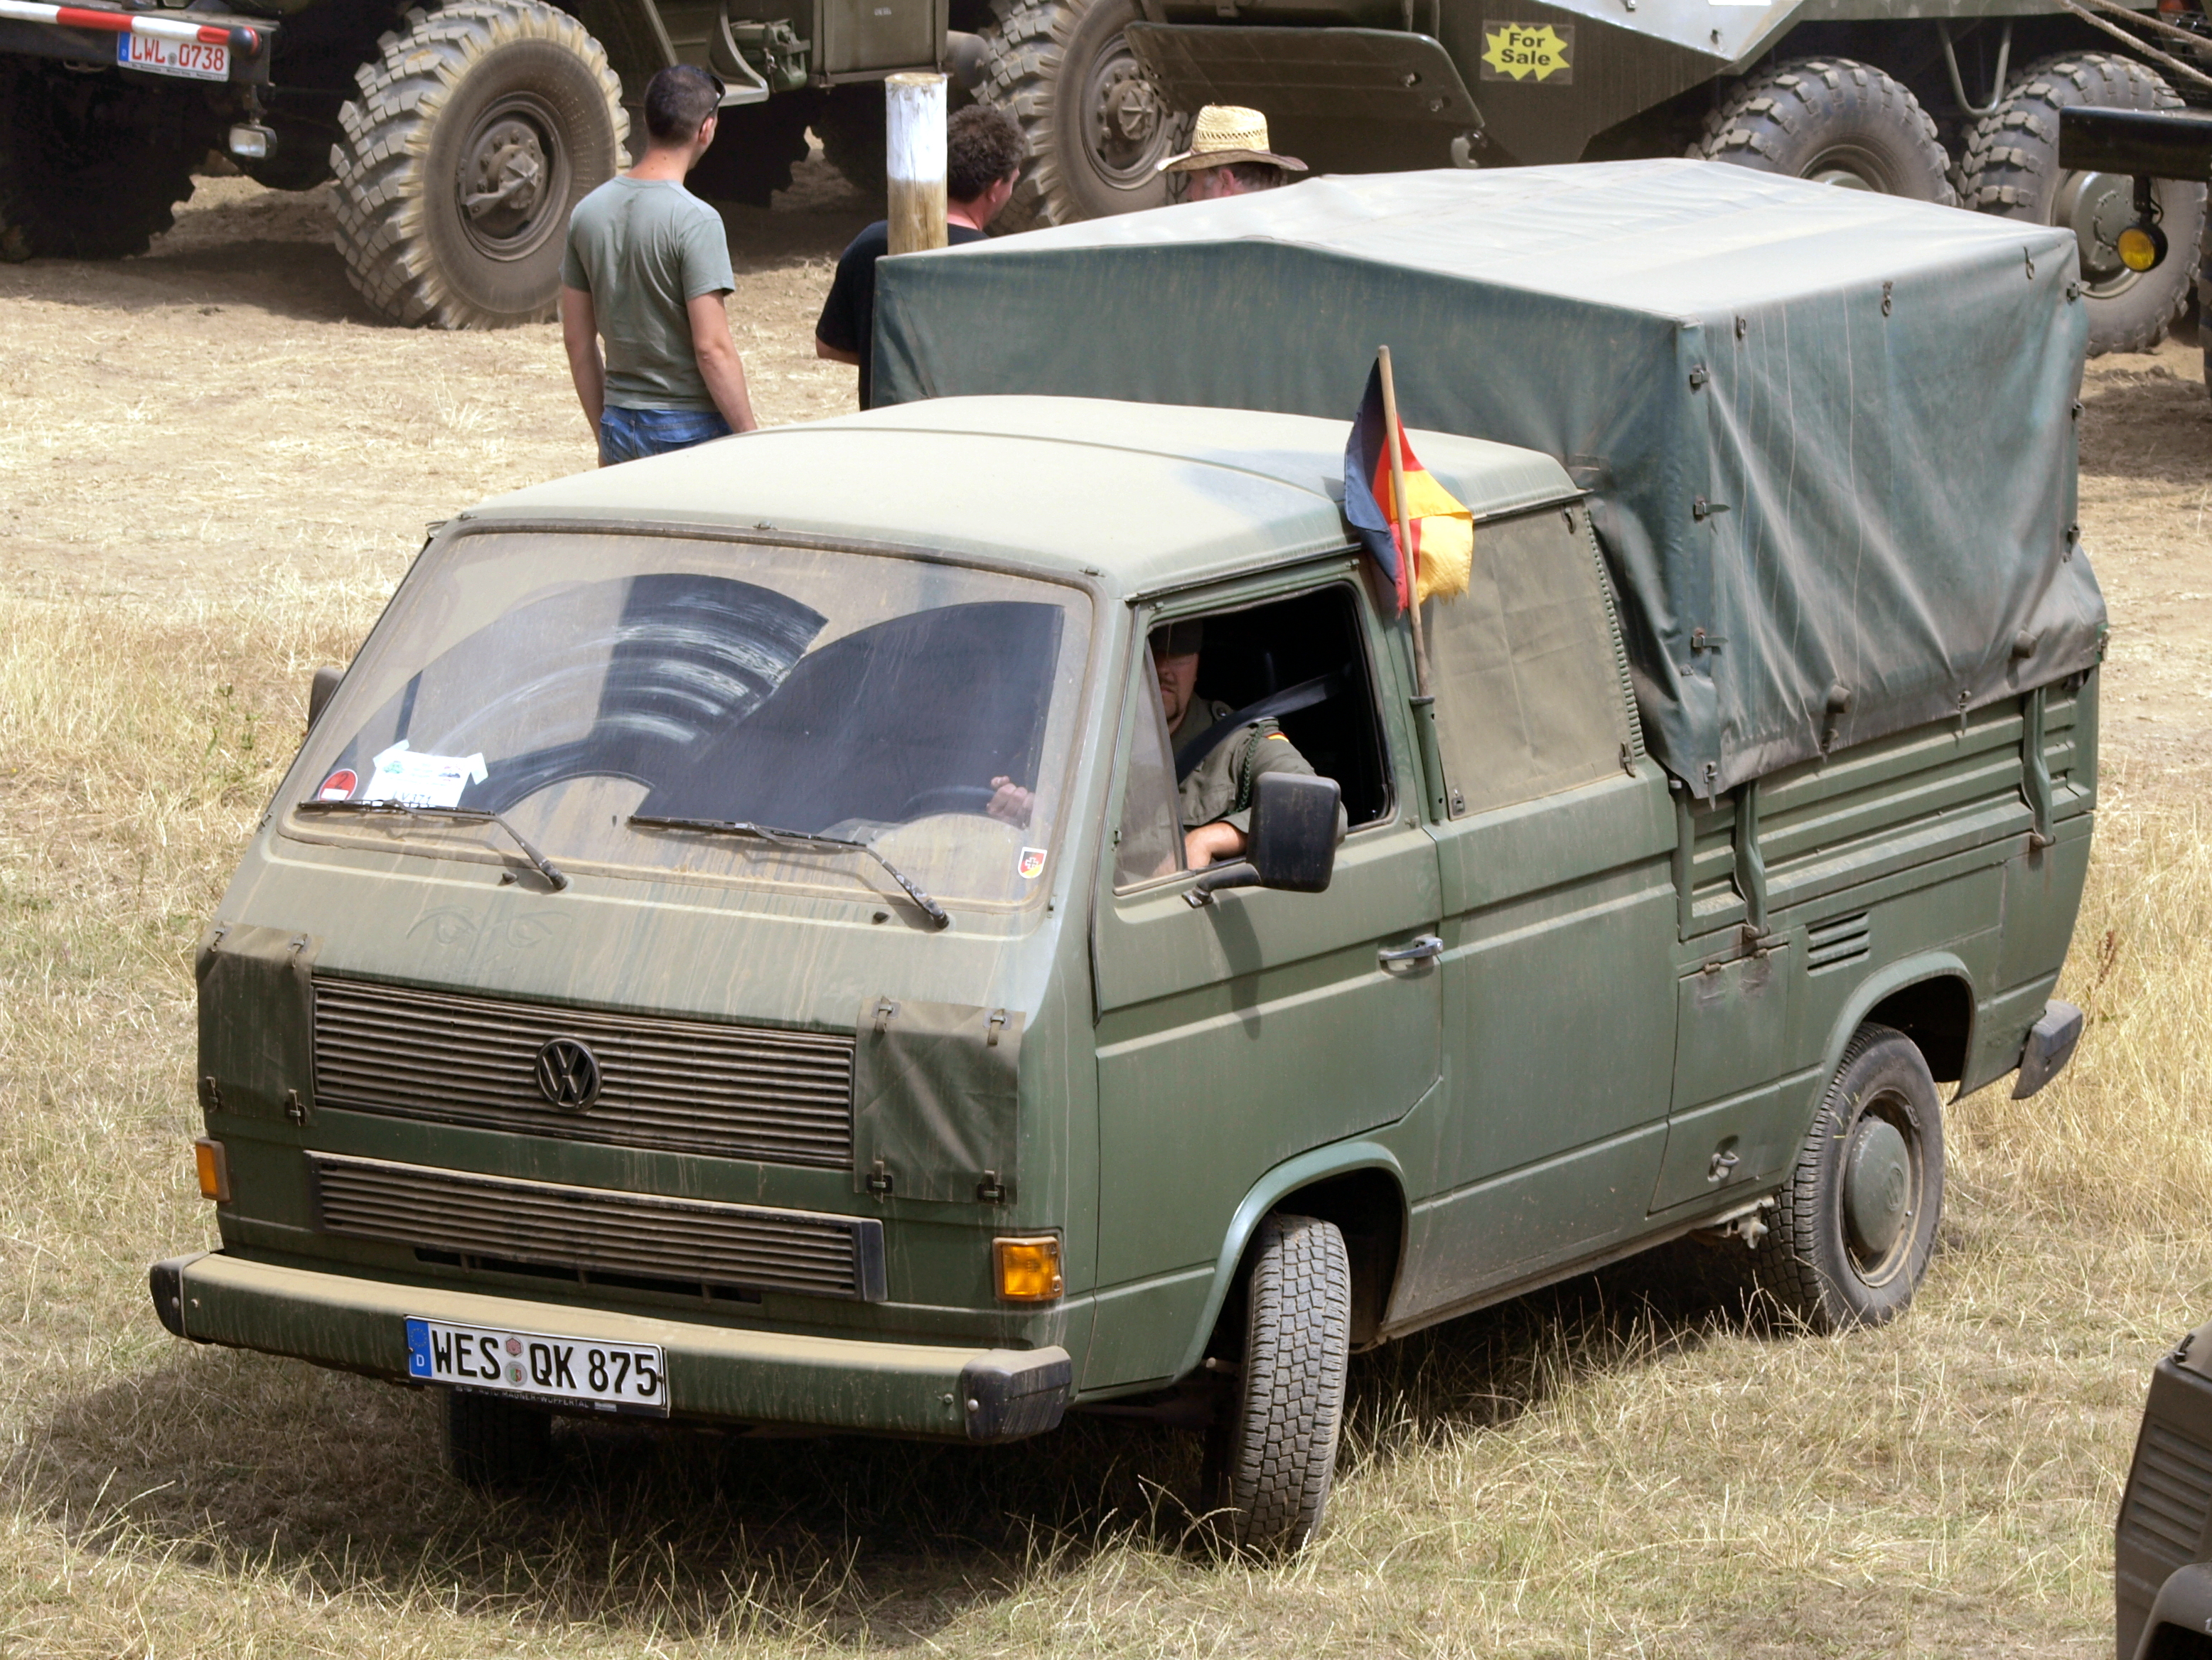 file volkswagen transporter t3 type 247 jpg wikimedia commons. Black Bedroom Furniture Sets. Home Design Ideas